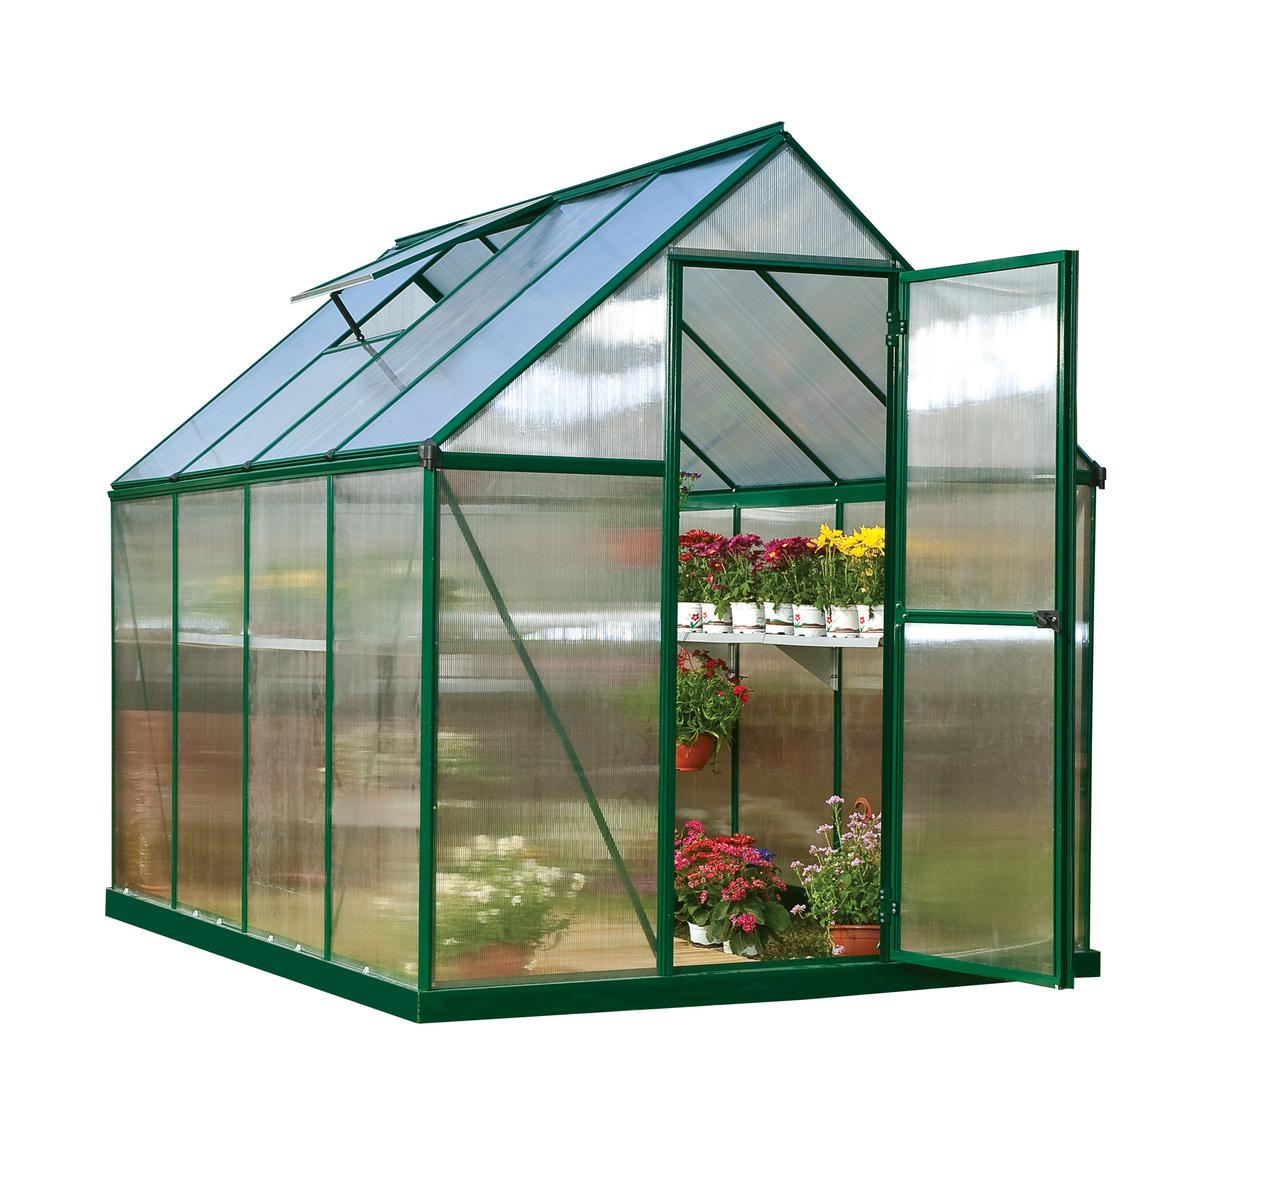 Mythos 6' x 8' Hobby Greenhouse, Green